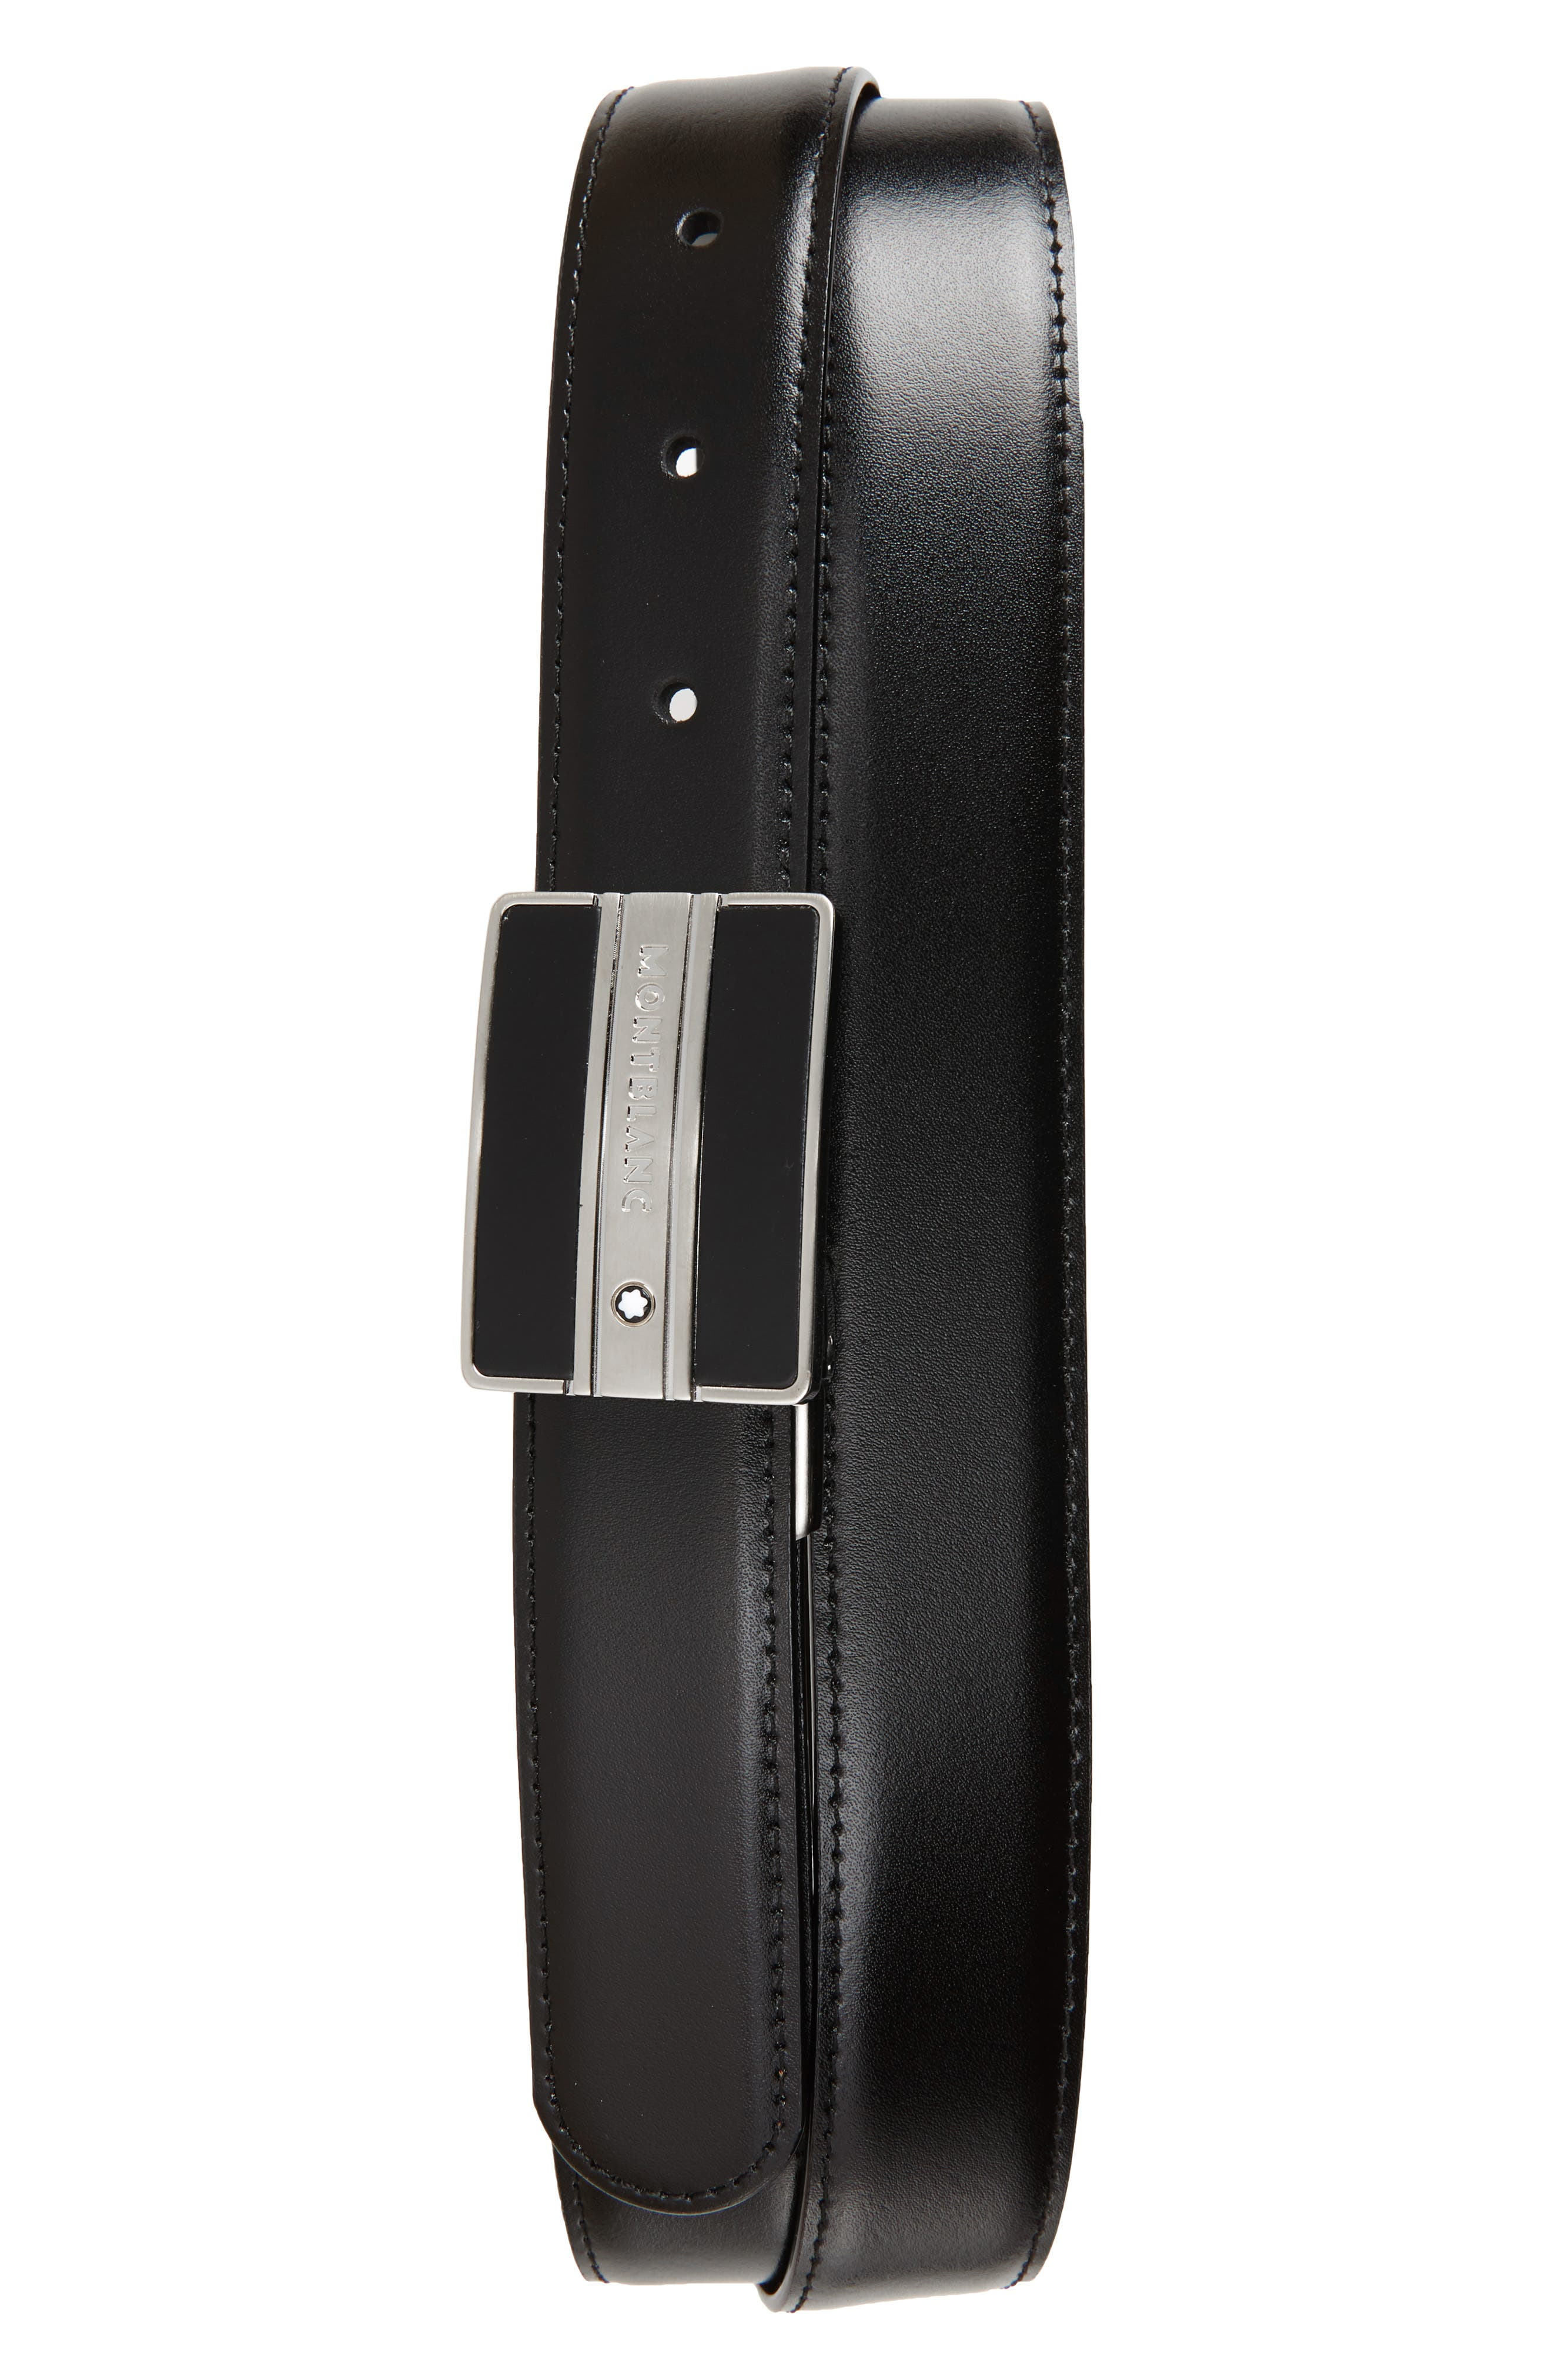 MONTBLANC, Meisterstück Buckle Reversible Leather Belt, Main thumbnail 1, color, BLACK/ BROWN